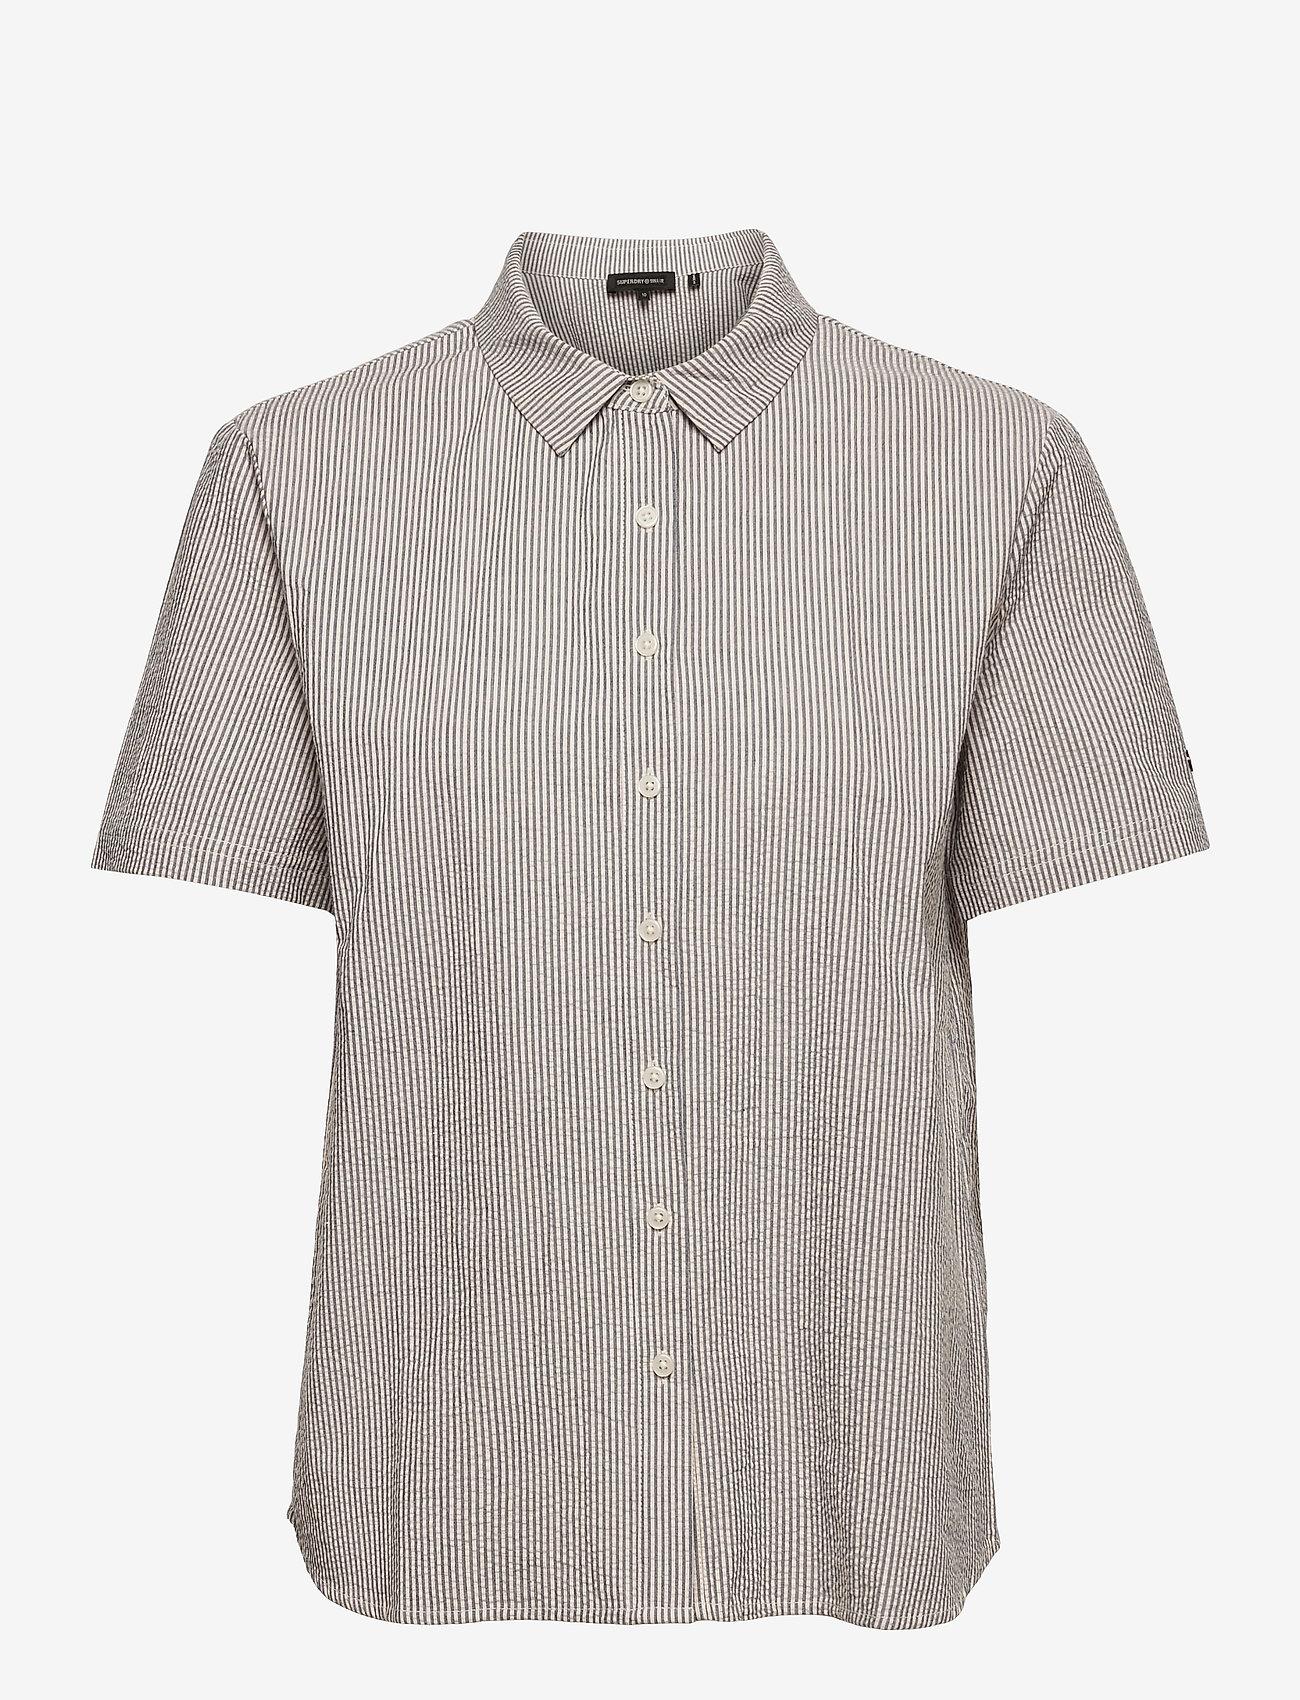 Superdry - STUDIOS SS SHIRT - short-sleeved shirts - navy stripe - 0